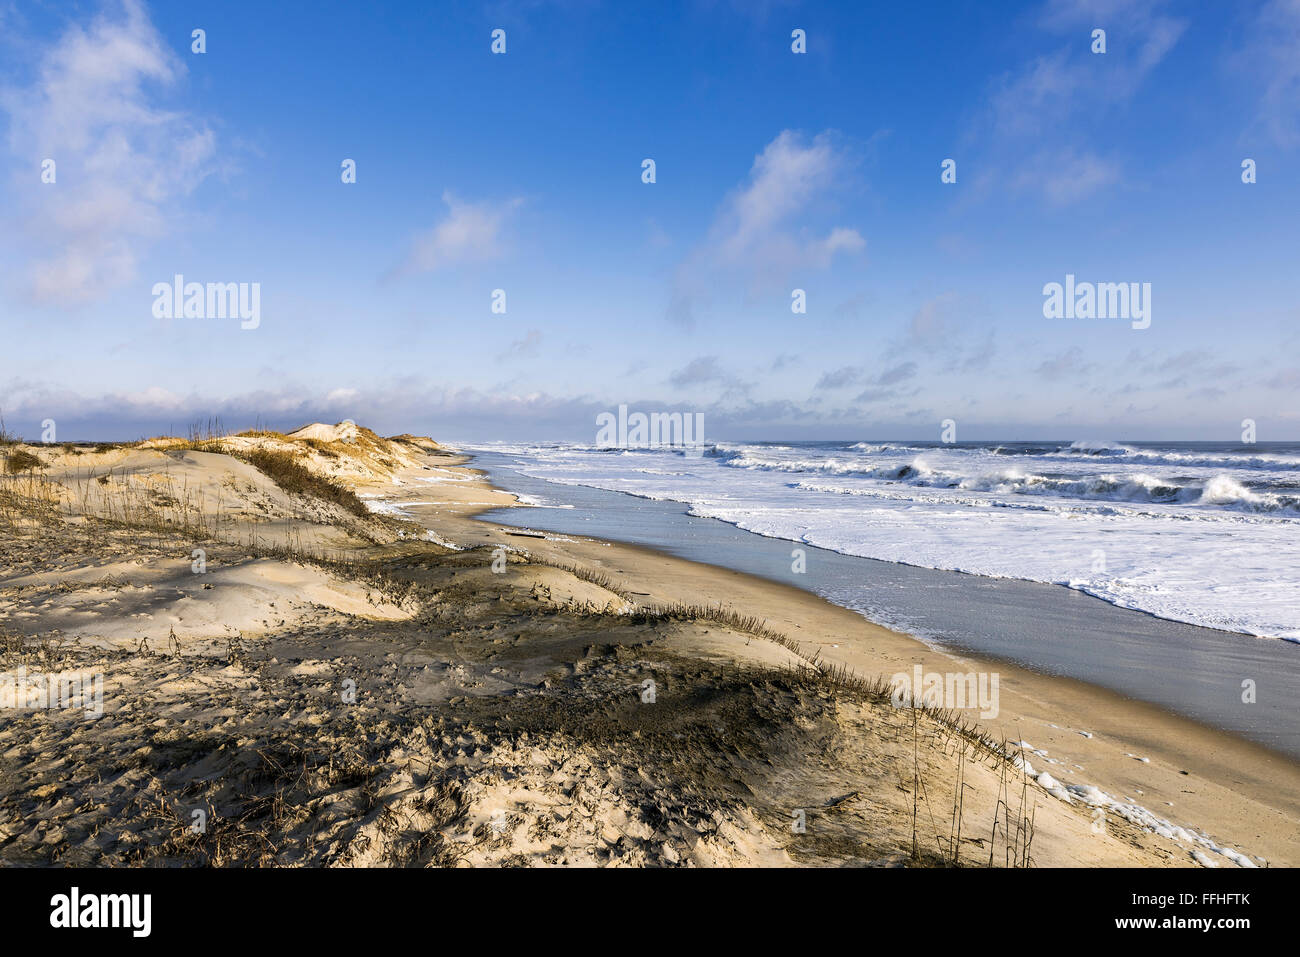 Pristine beach along Cape Hatteras National Seashore, Outer Banks, North Carolina, USA - Stock Image